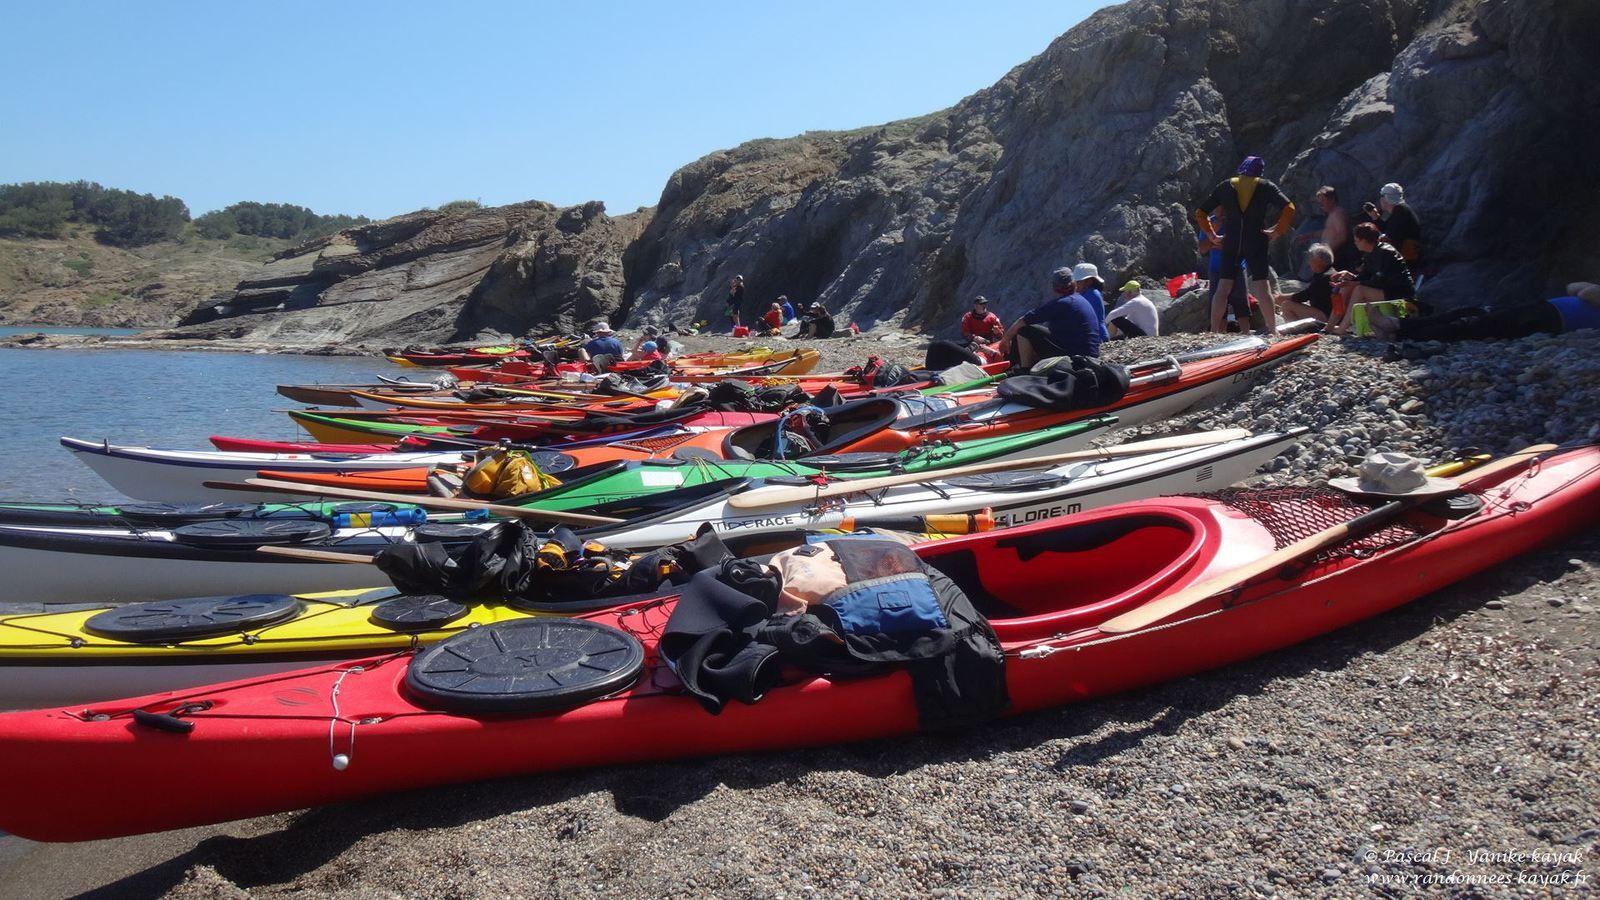 Pagaia 2017 : VIIème symposium international de kayak de mer (2/2)